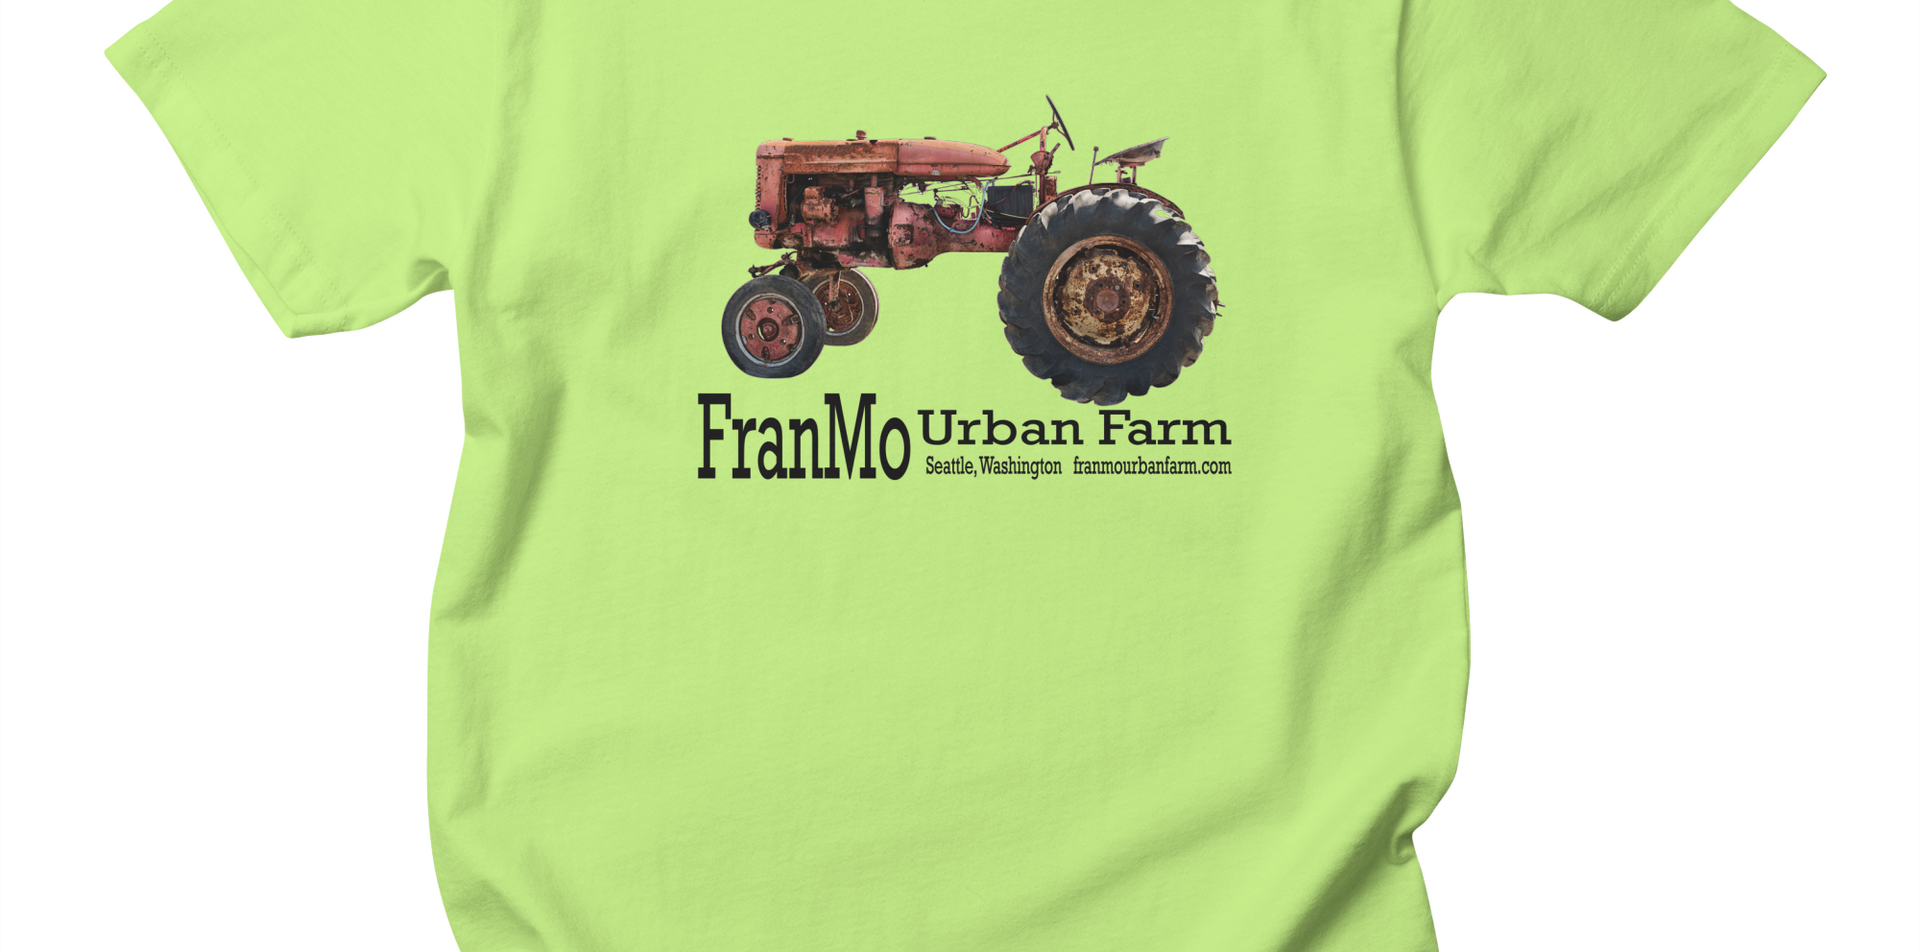 franmo-urban-farm-T1.png